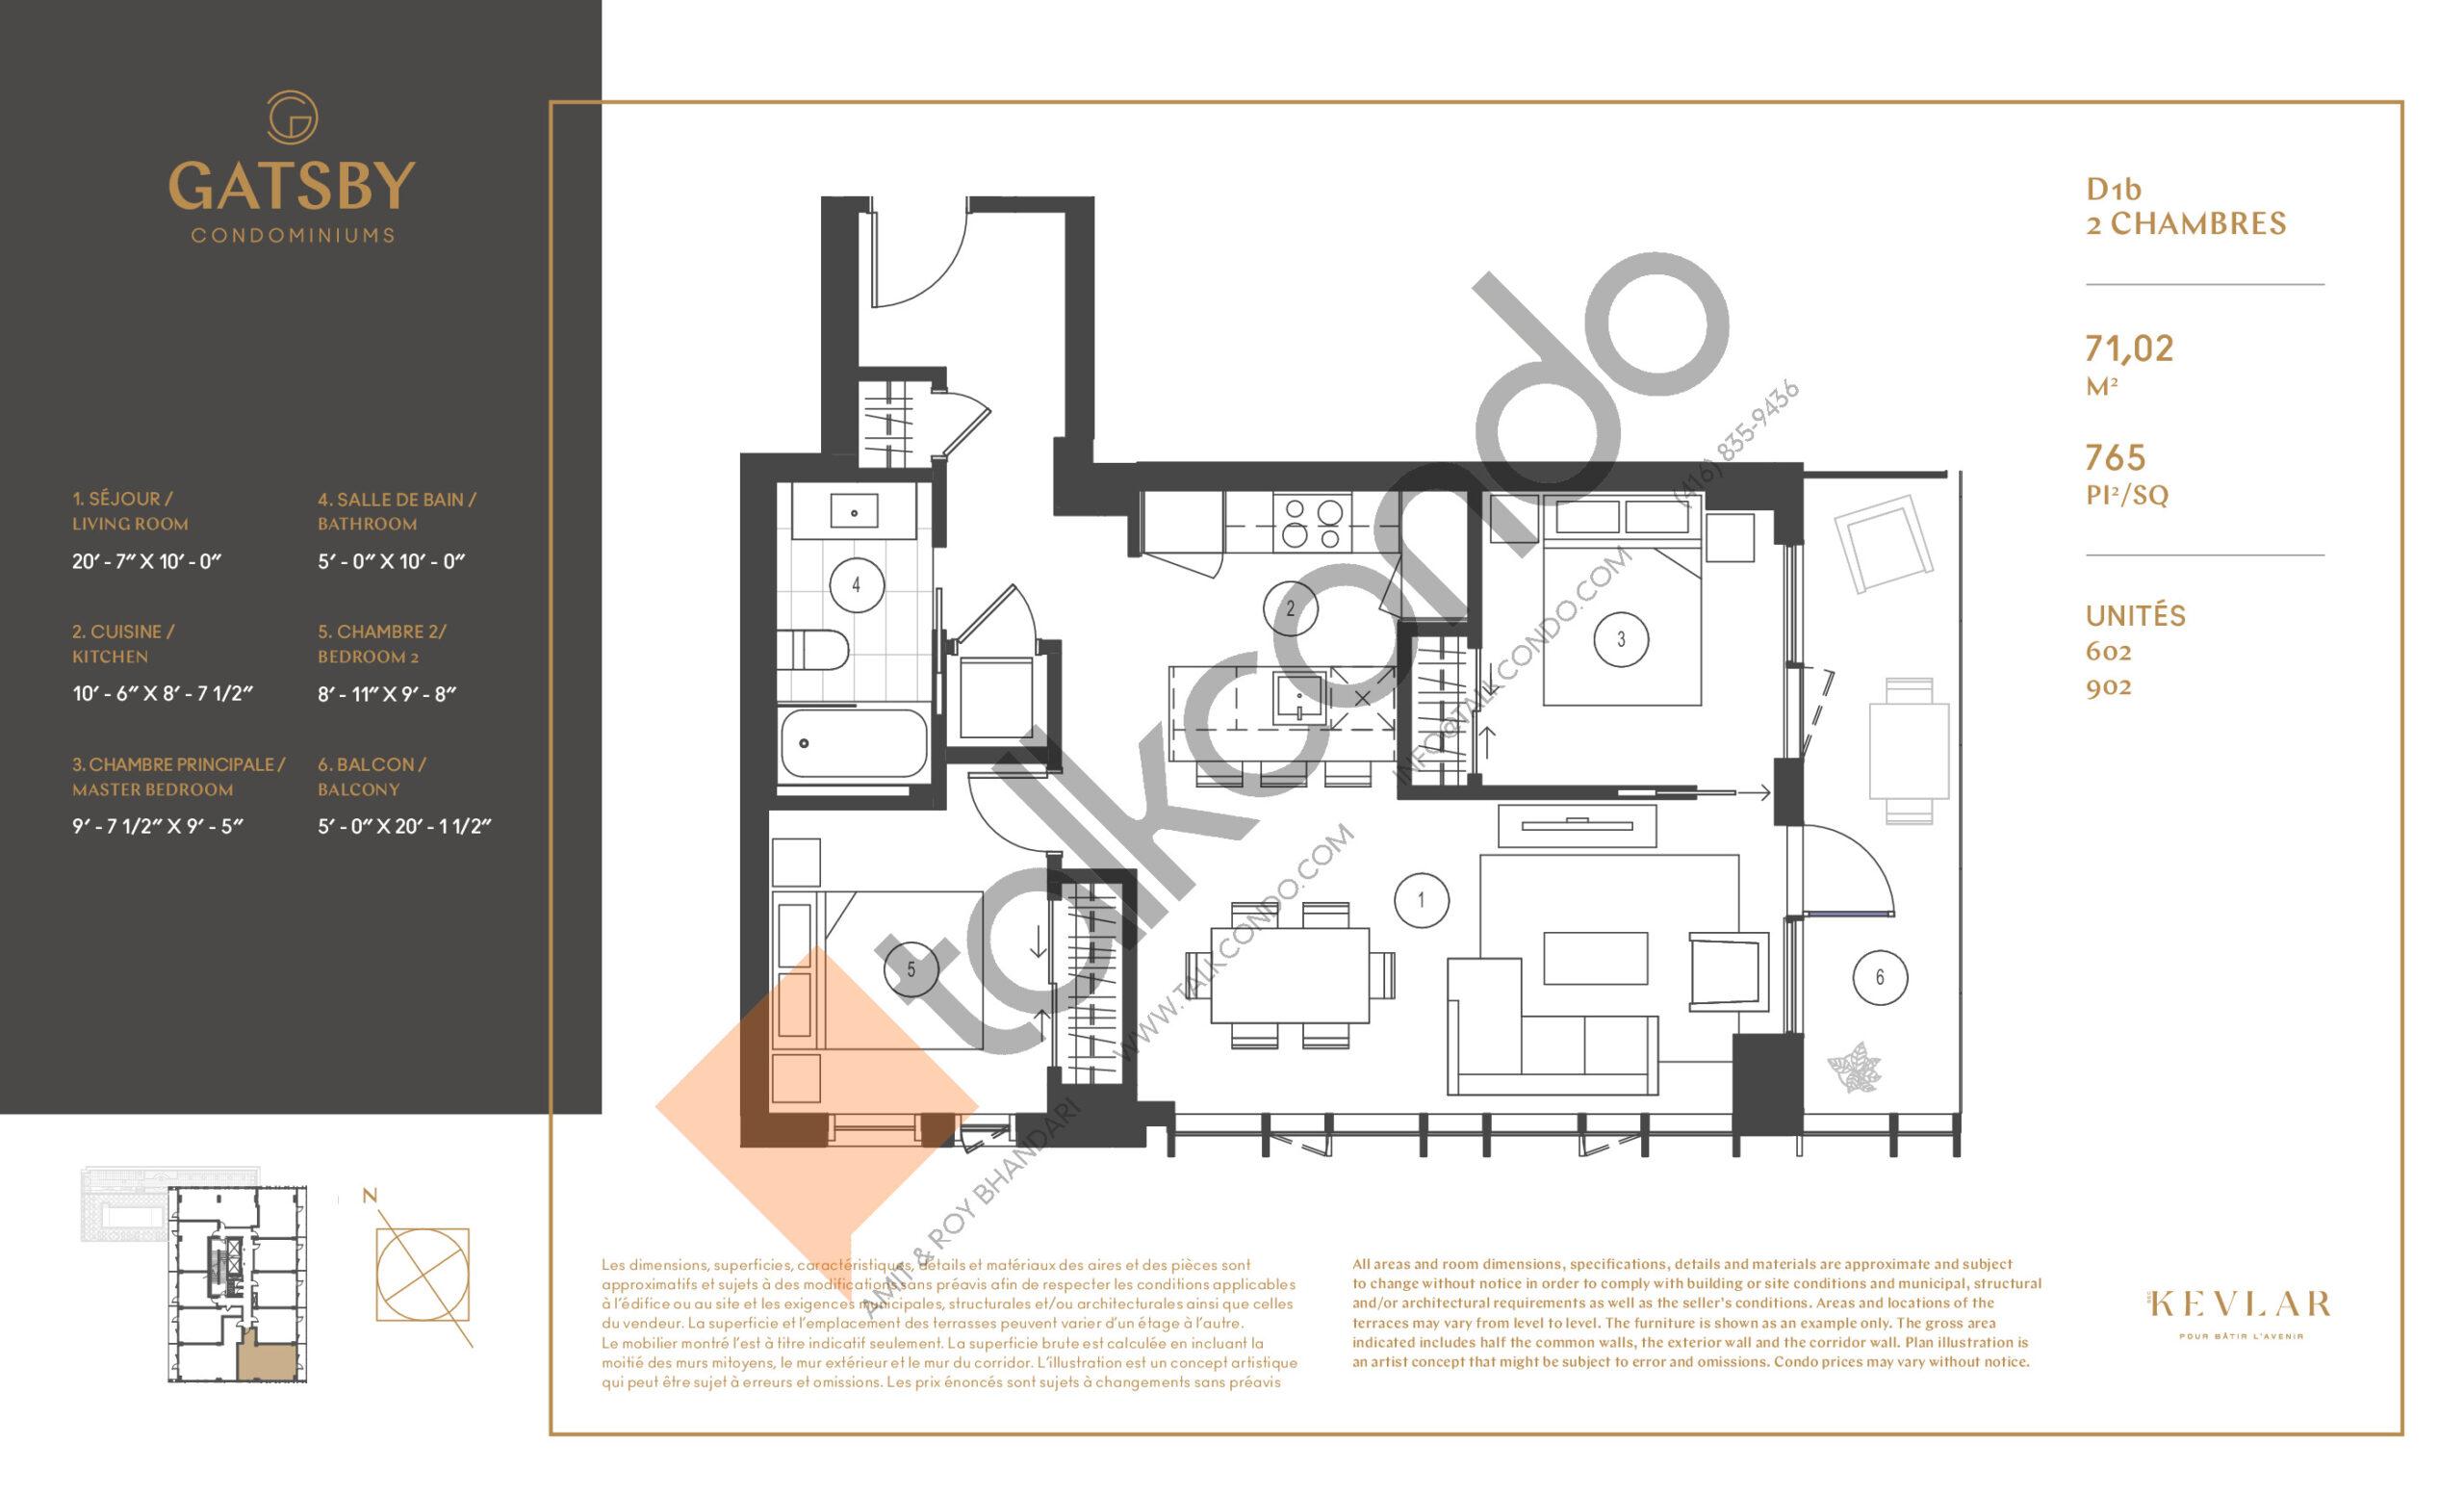 D1b Floor Plan at Gatsby Condos - 765 sq.ft